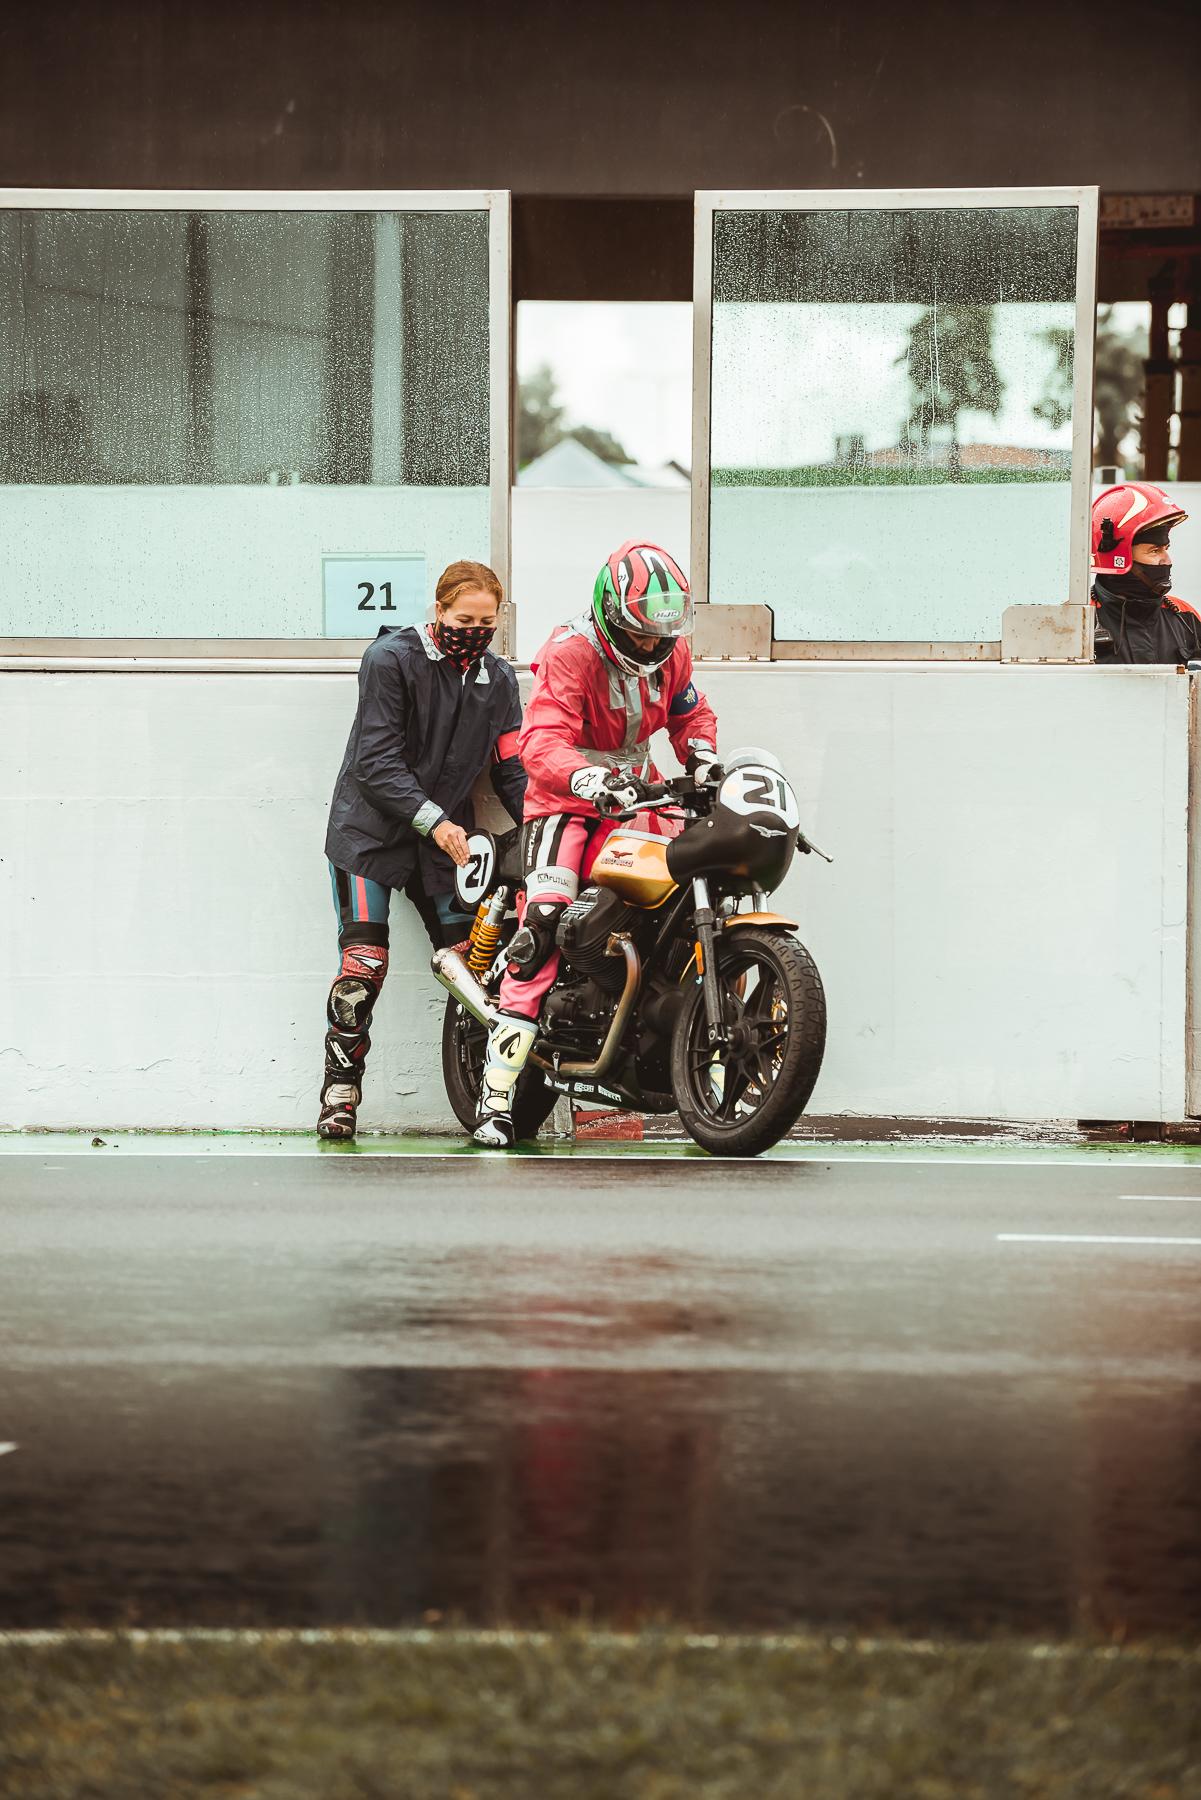 2020-Moto-Guzzi-Endurance-DAY-3-RAIN-30